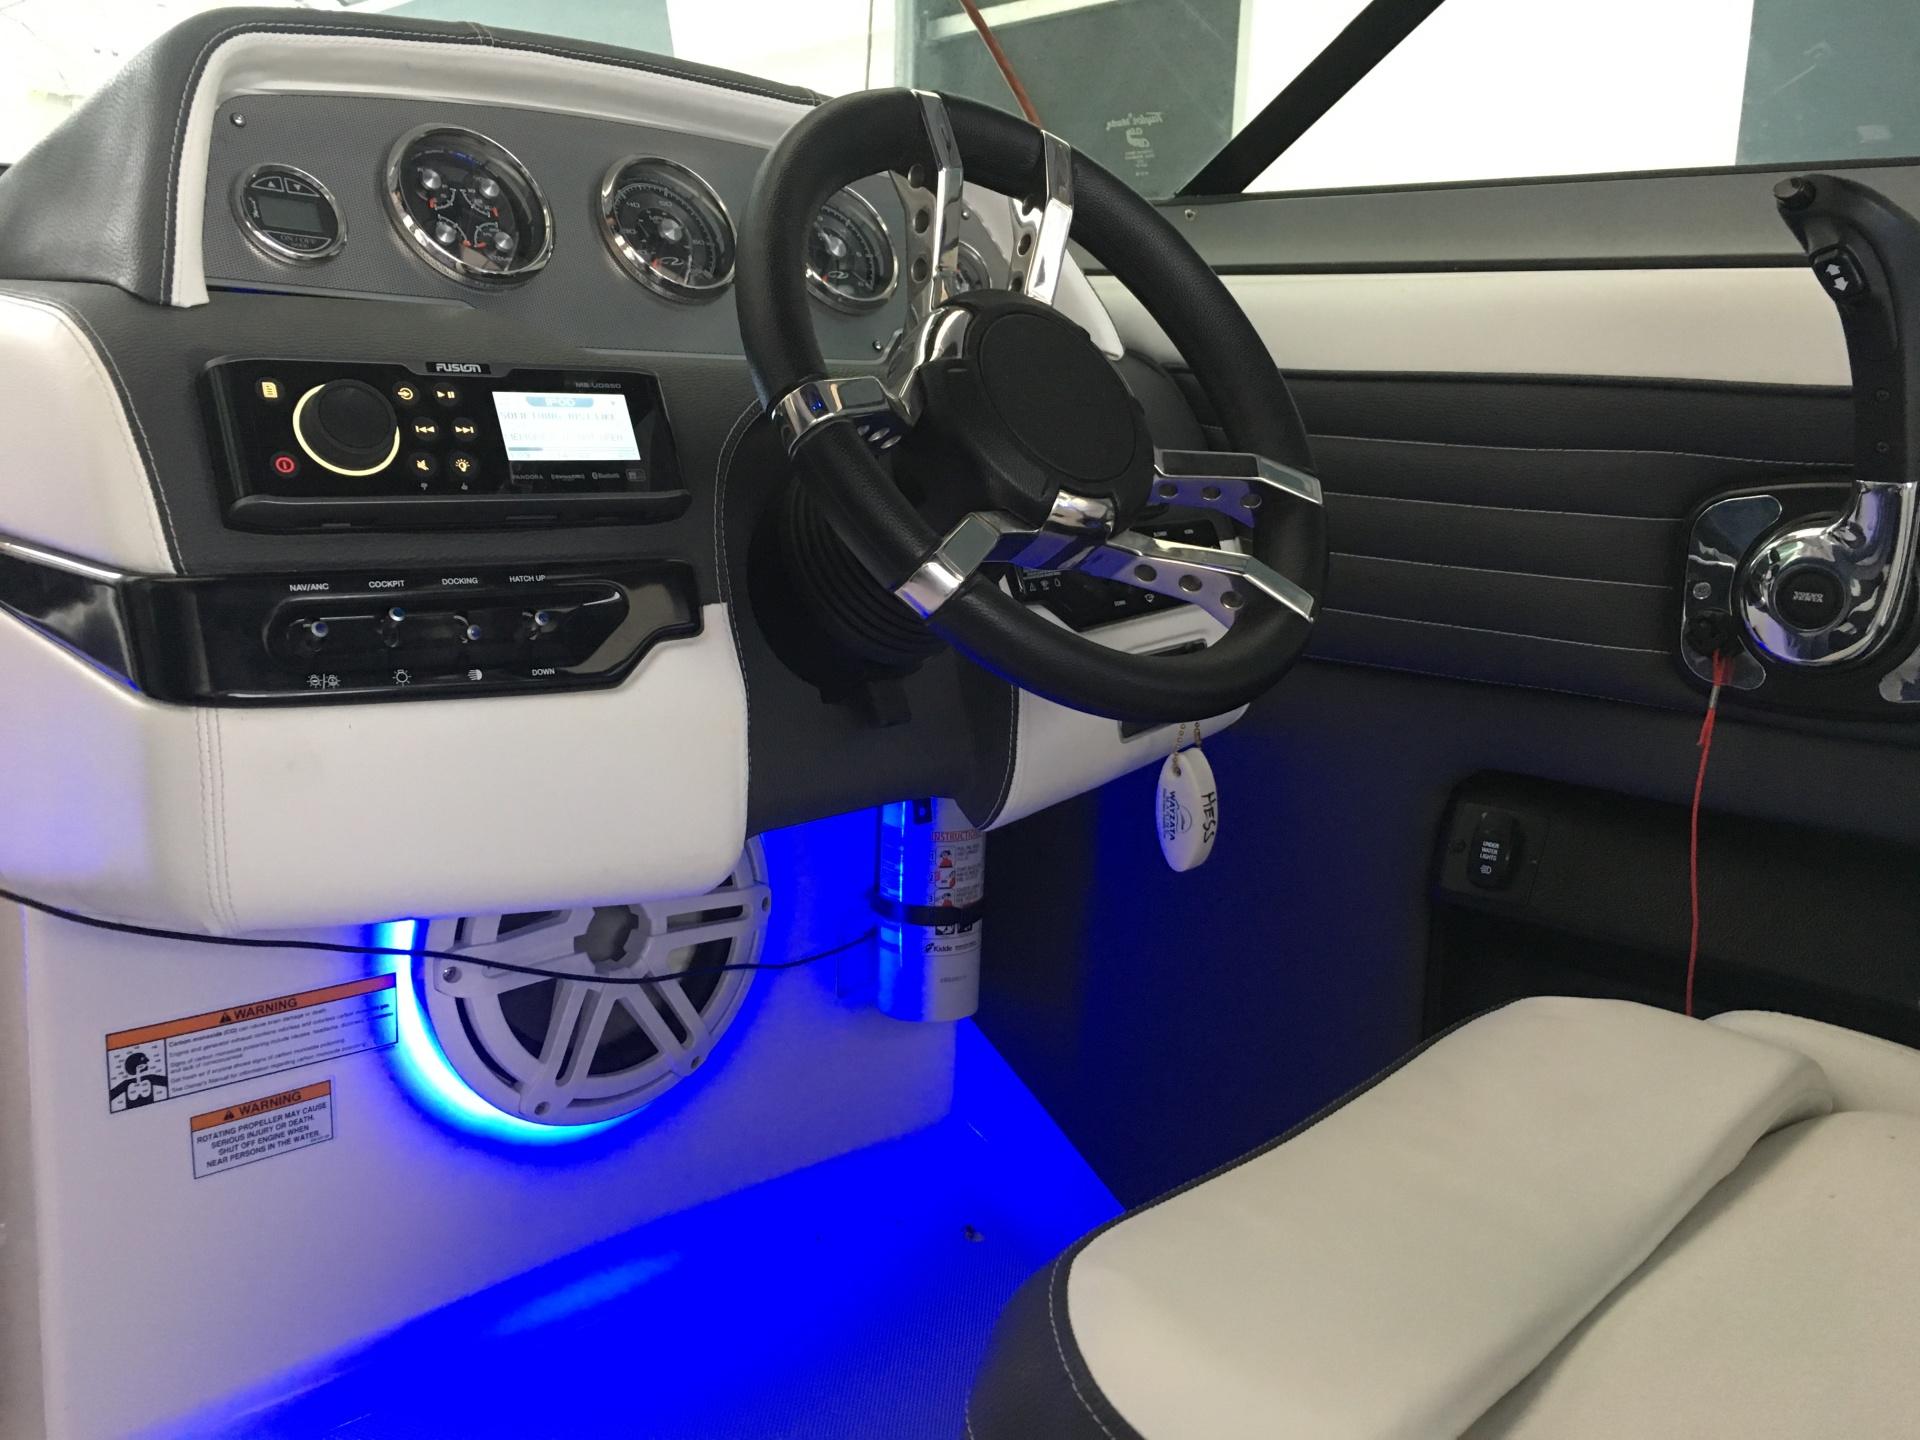 2016 Regal 2500 w/ full JL Audio system and LED speaker rings